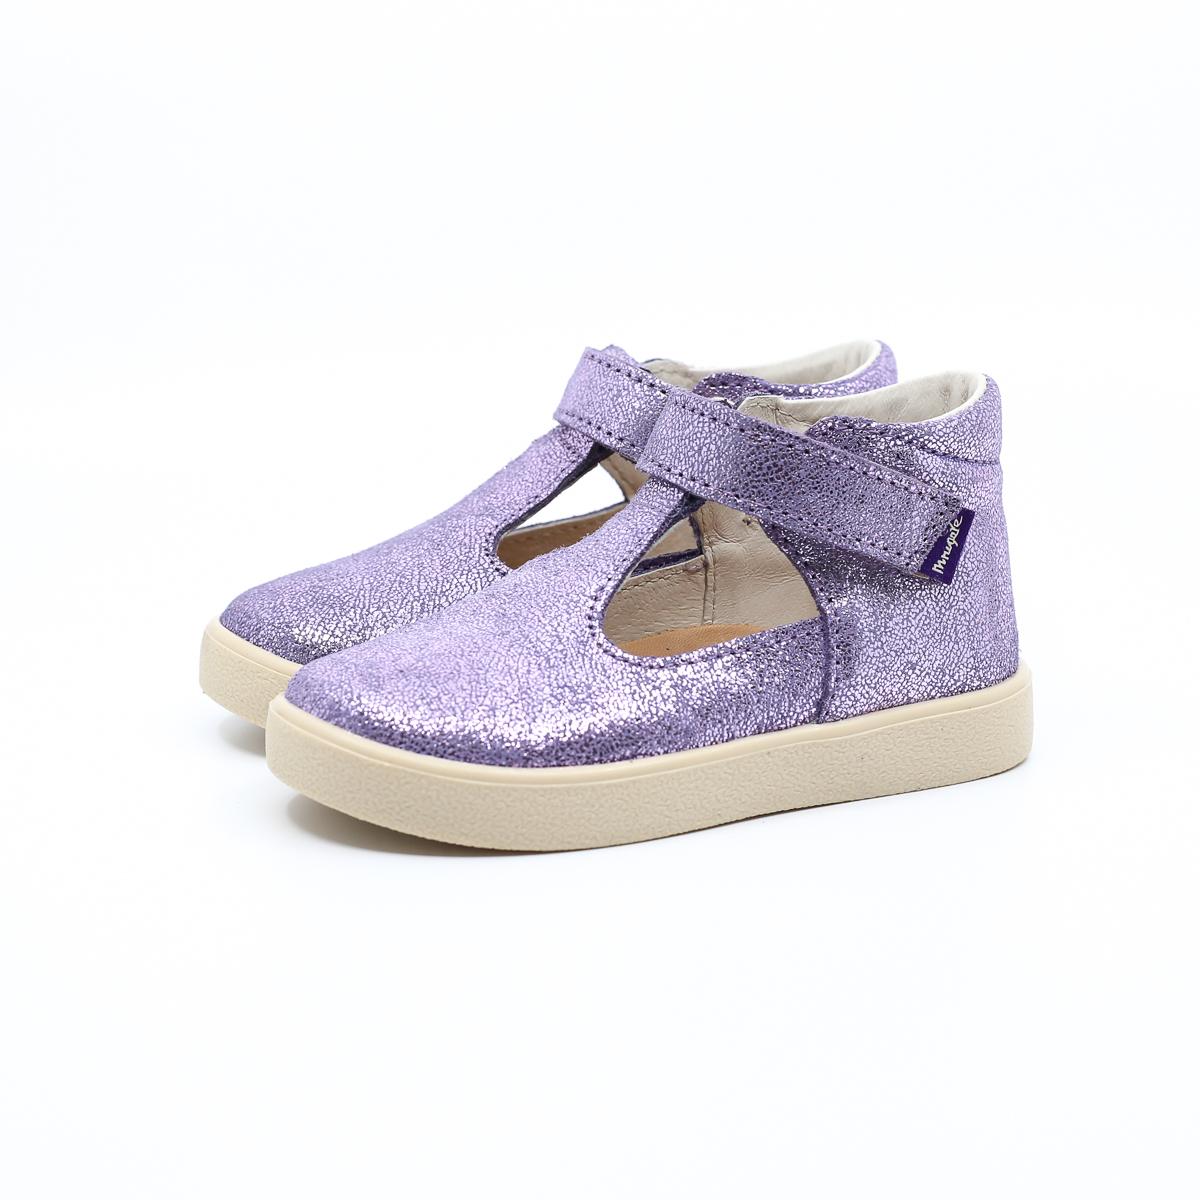 MRUGAŁA baleriny dziecięce NINA lavender brokat 20-25